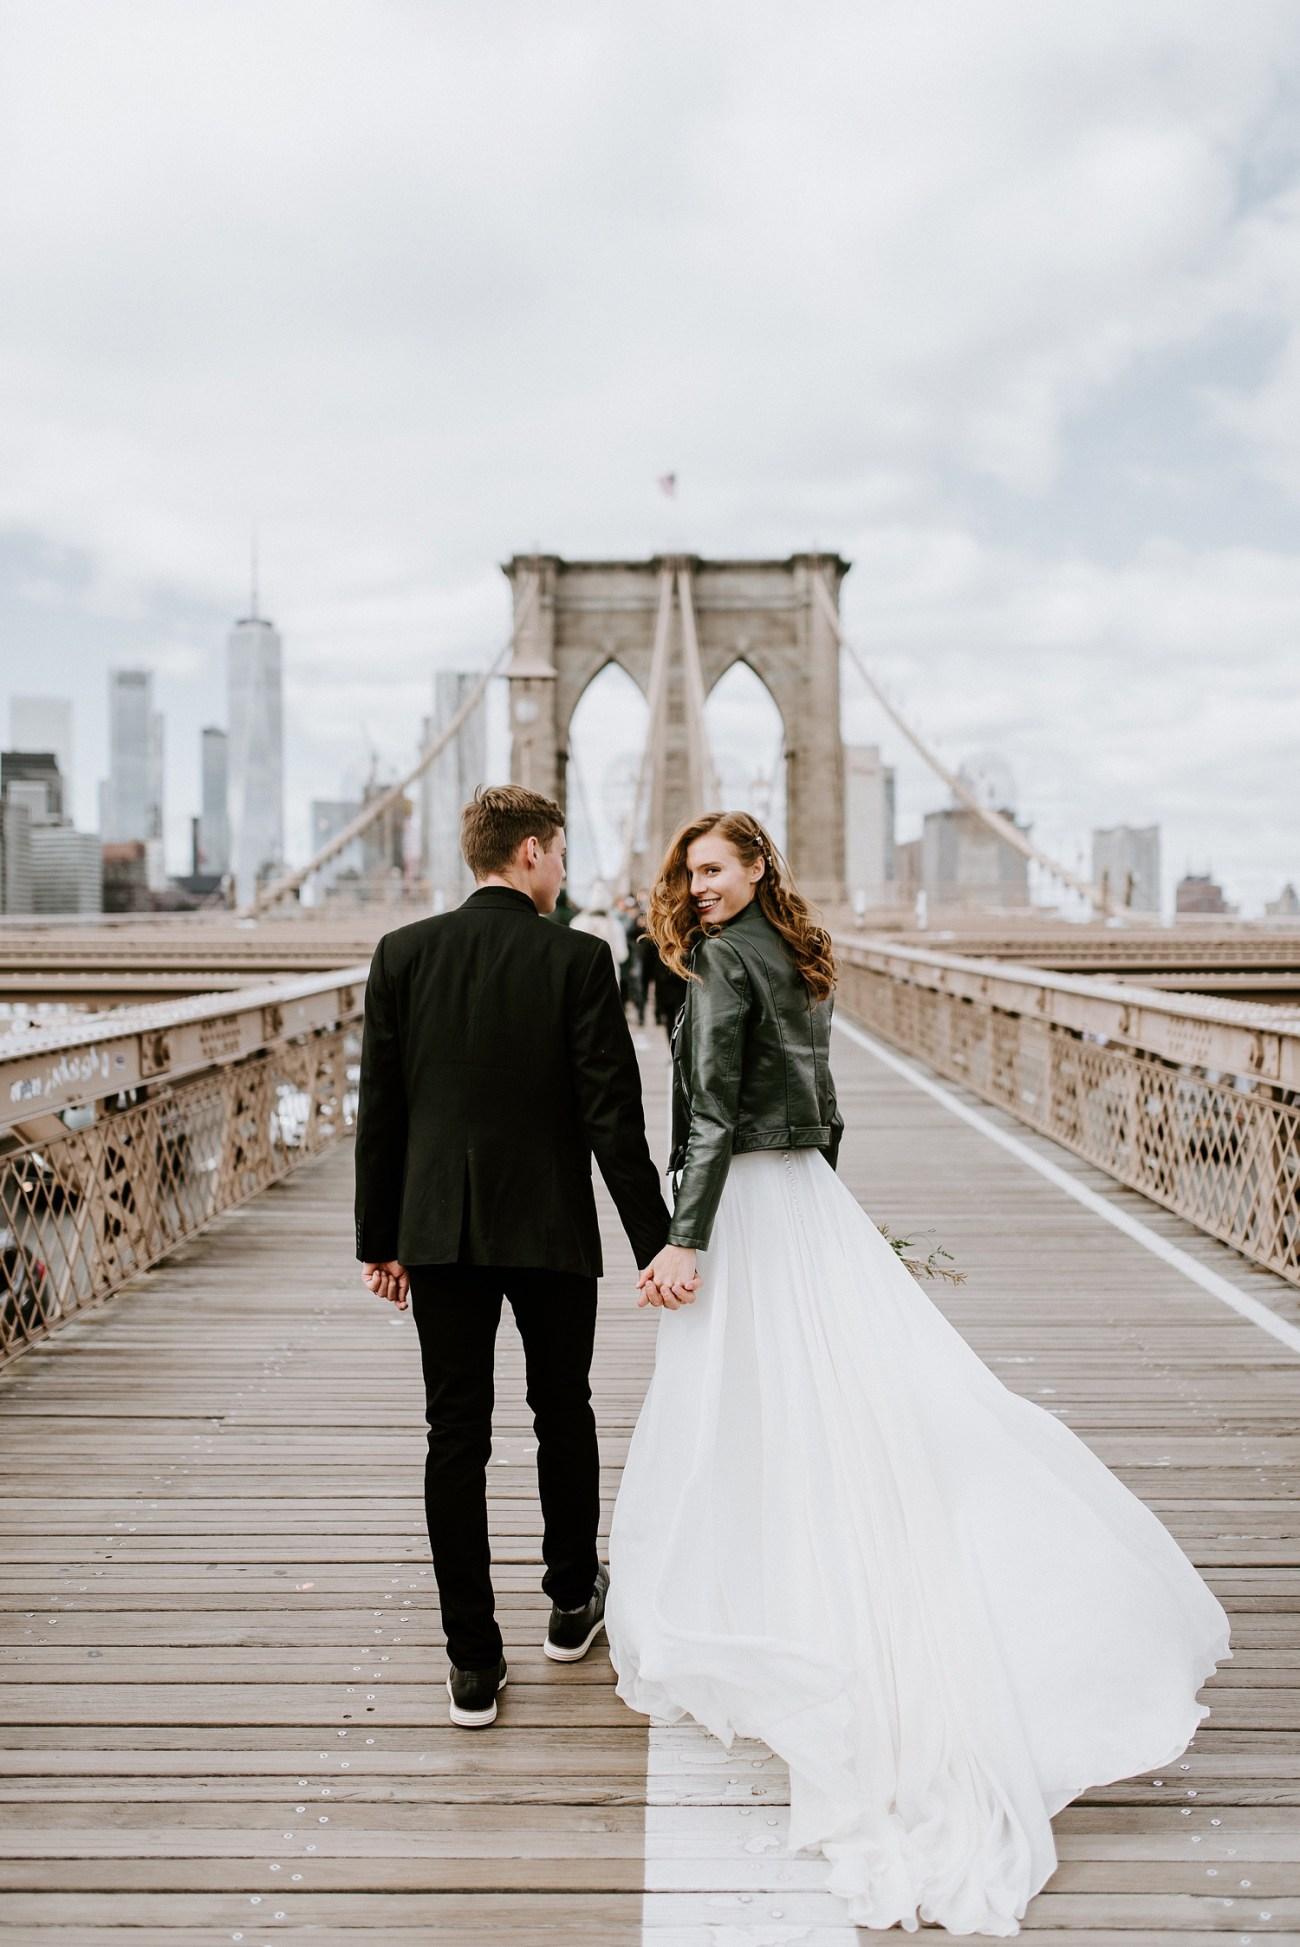 Bride and Groom walking on the Brooklyn Bridge for their bridal portrait. Brooklyn wedding photos. Dumbo Brooklyn Bride and Groom elopement photos. Anais Possamai Photography. New York Wedding Photographer